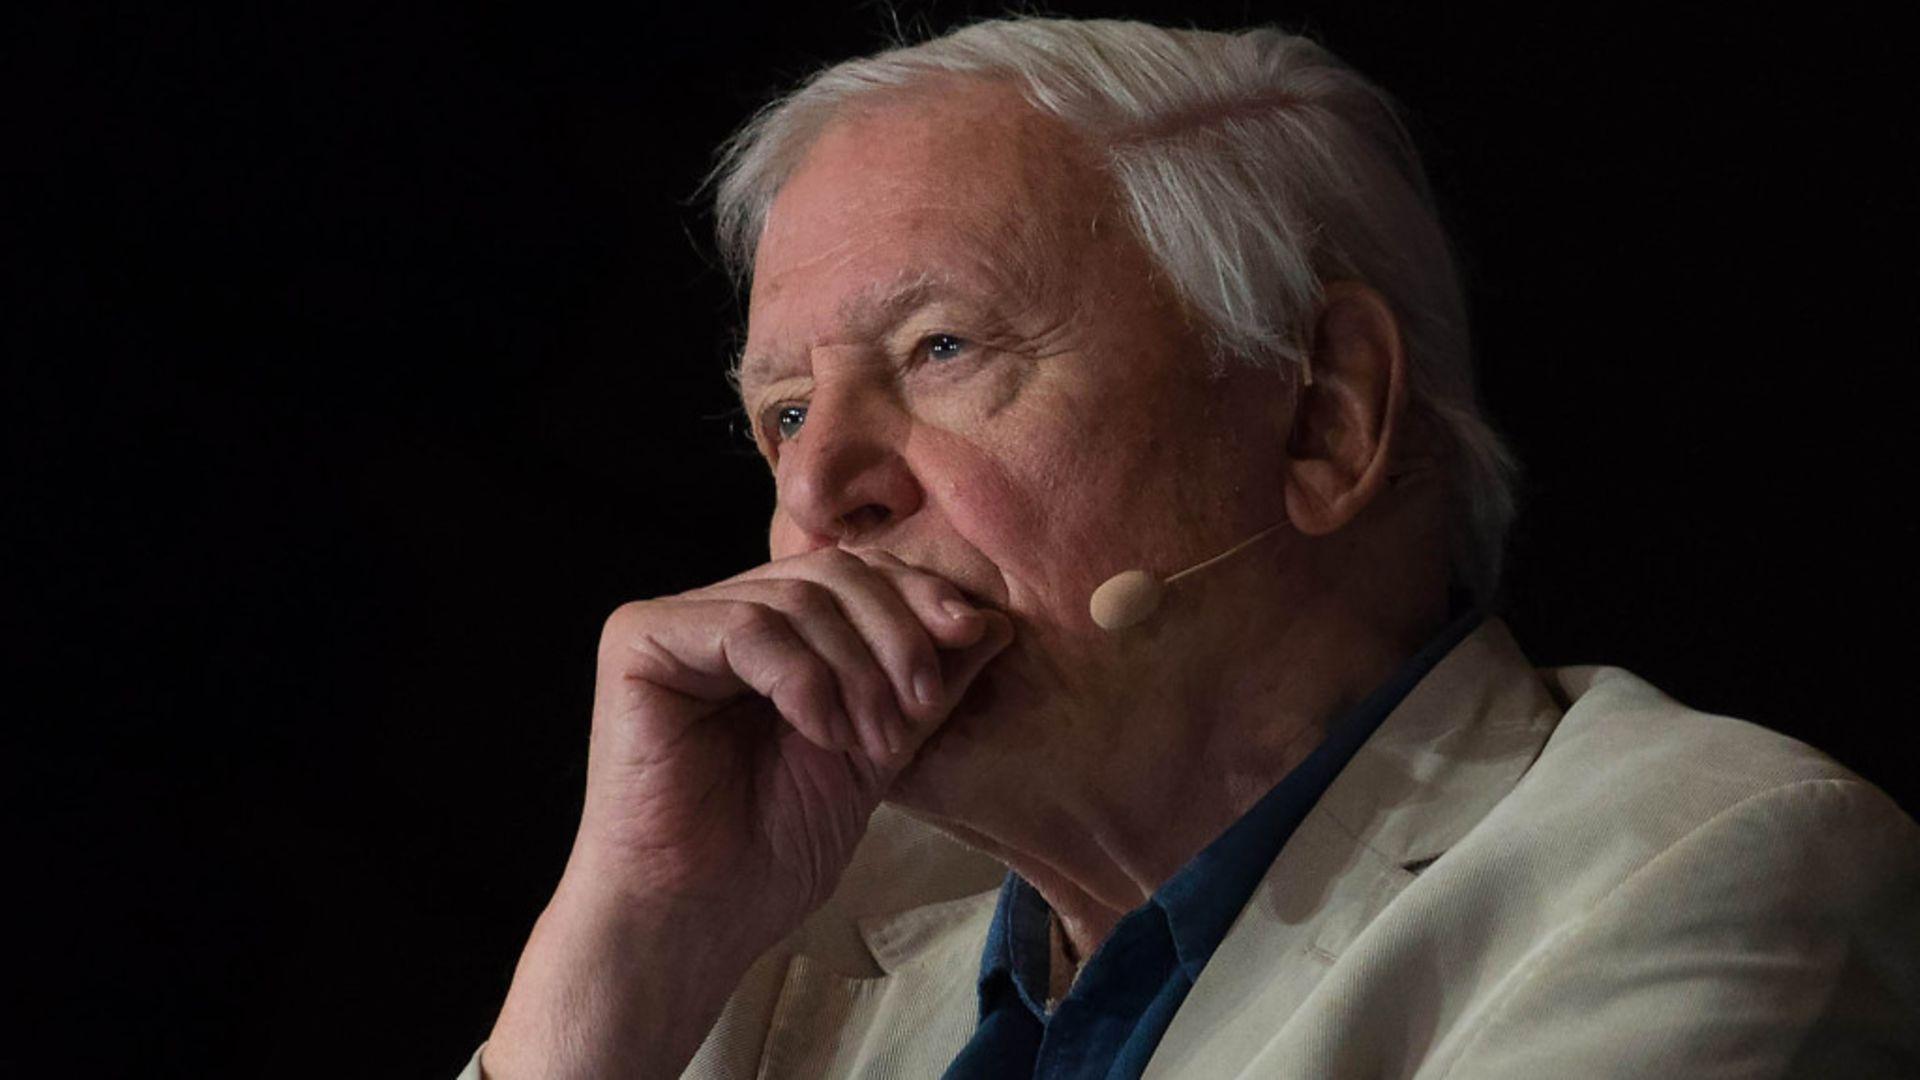 David Attenborough - Credit: PA Wire/PA Images